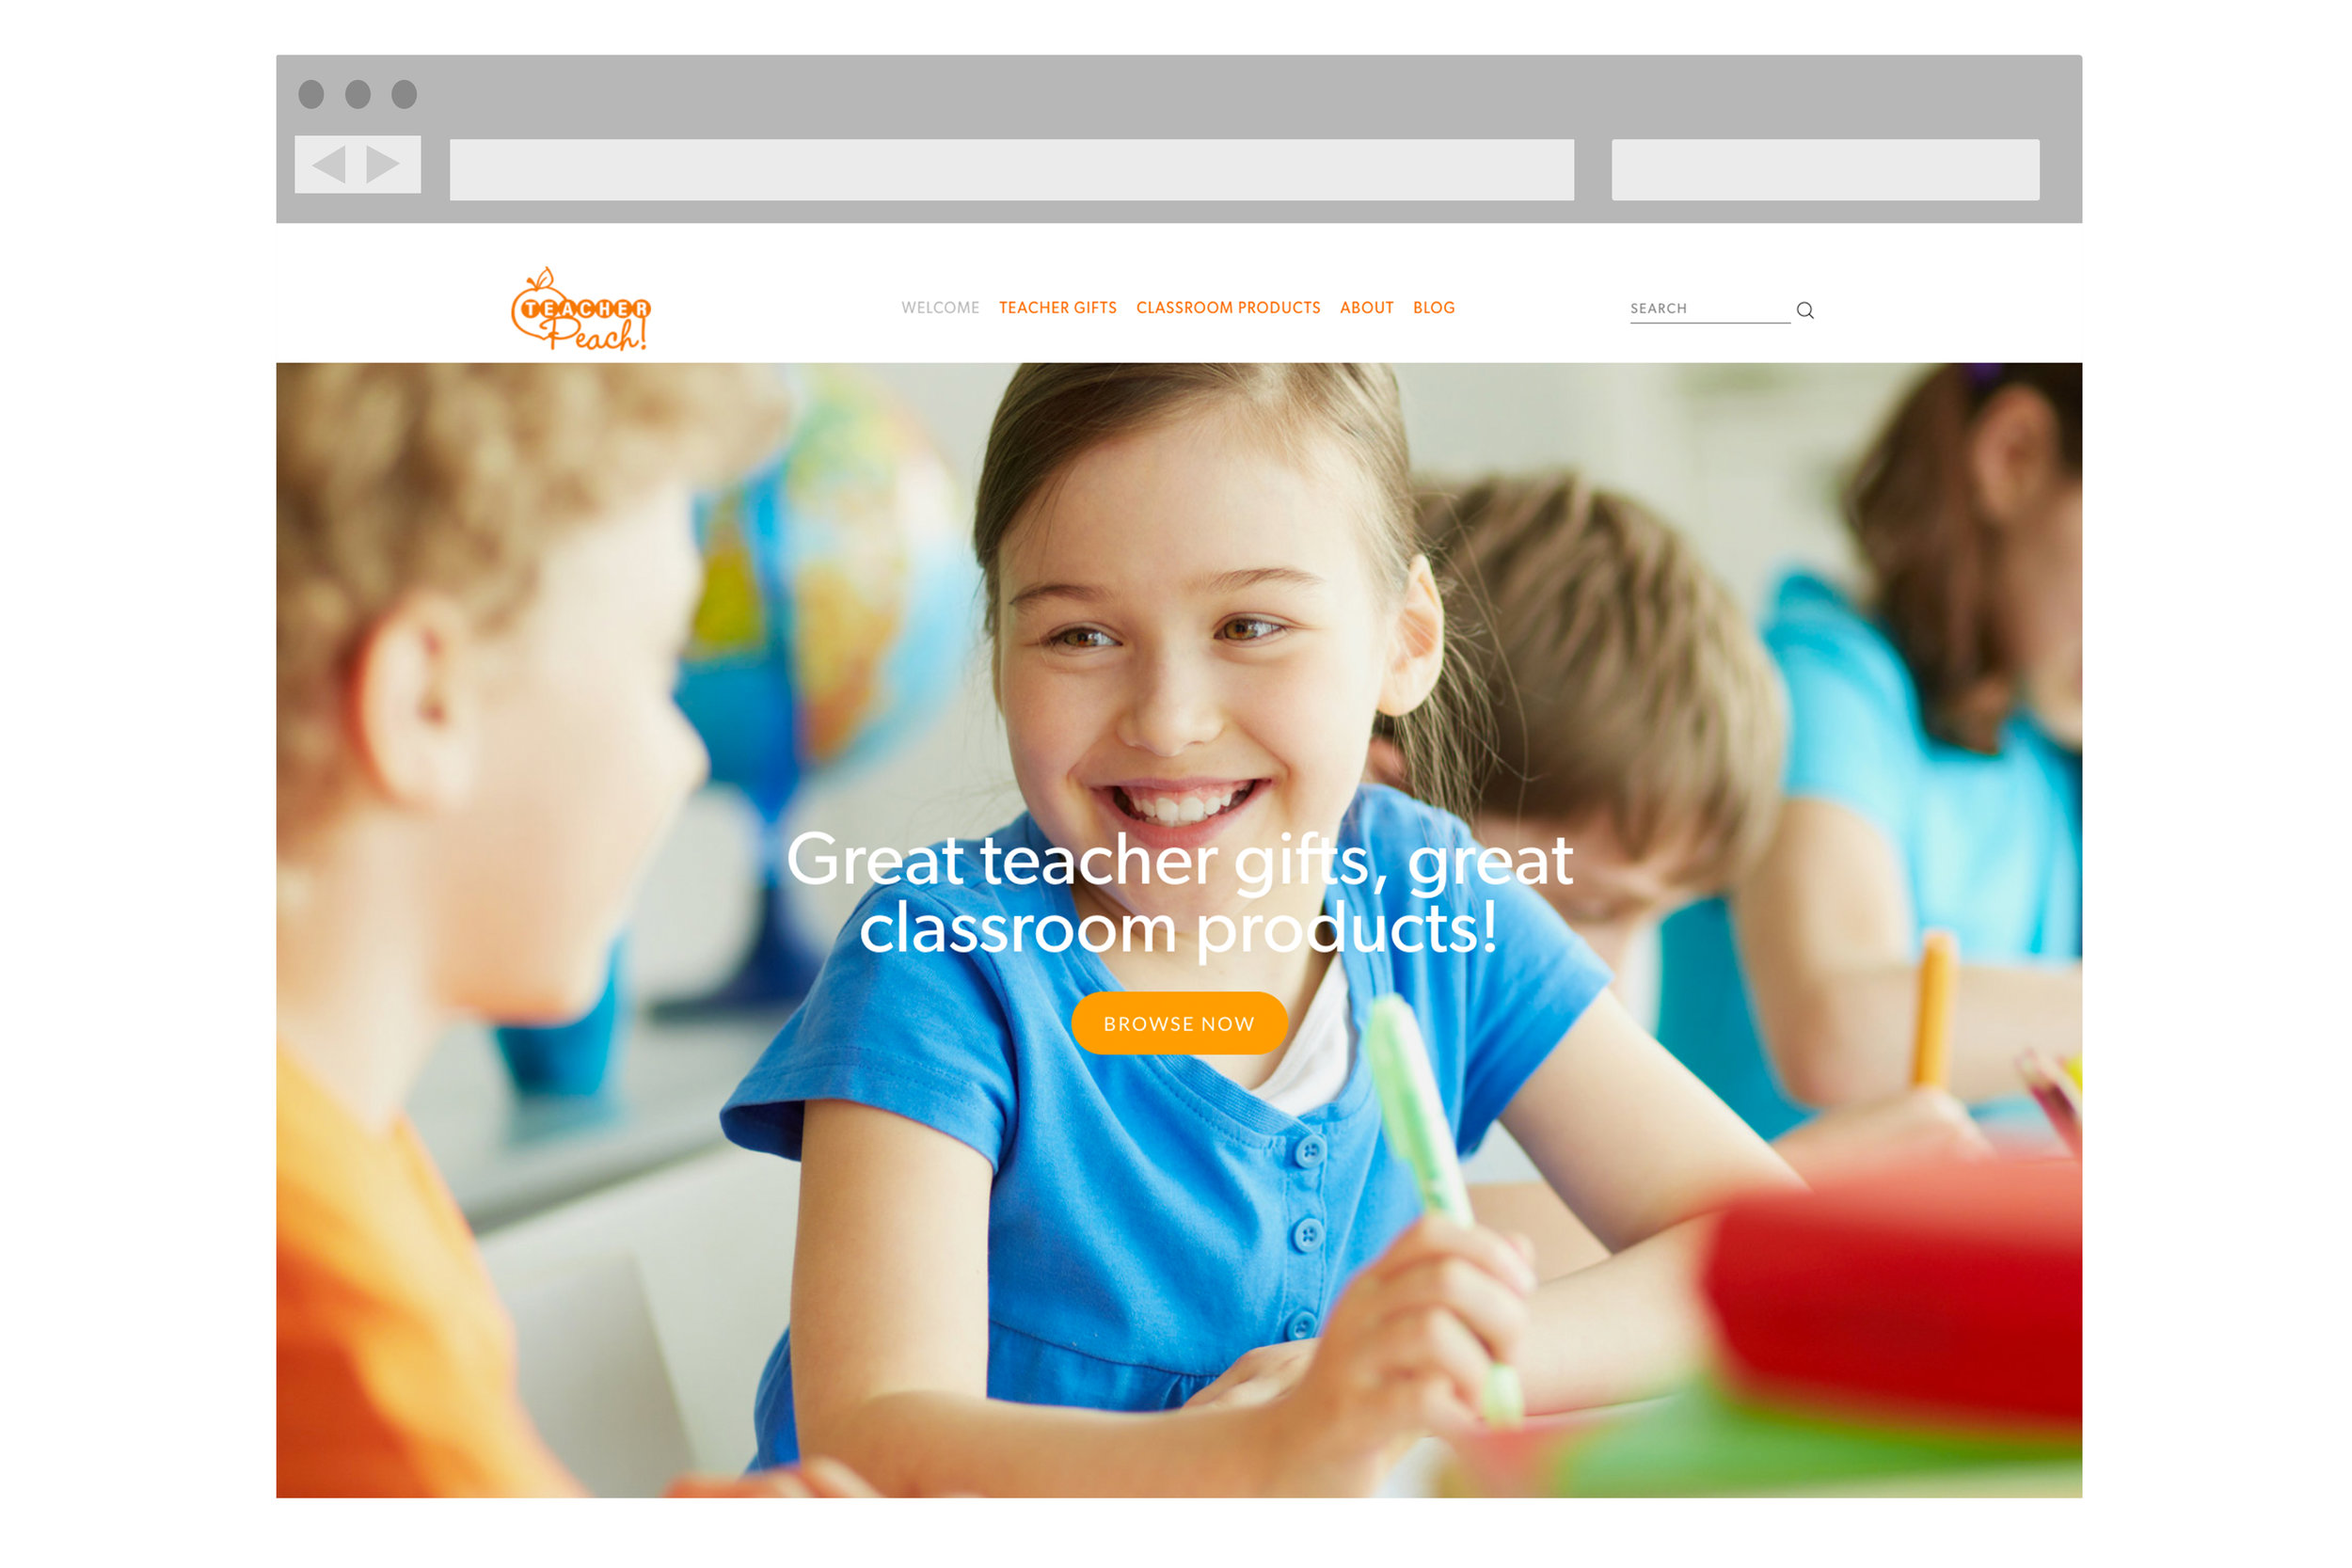 Portfolio_TeacherPeach_1.jpg